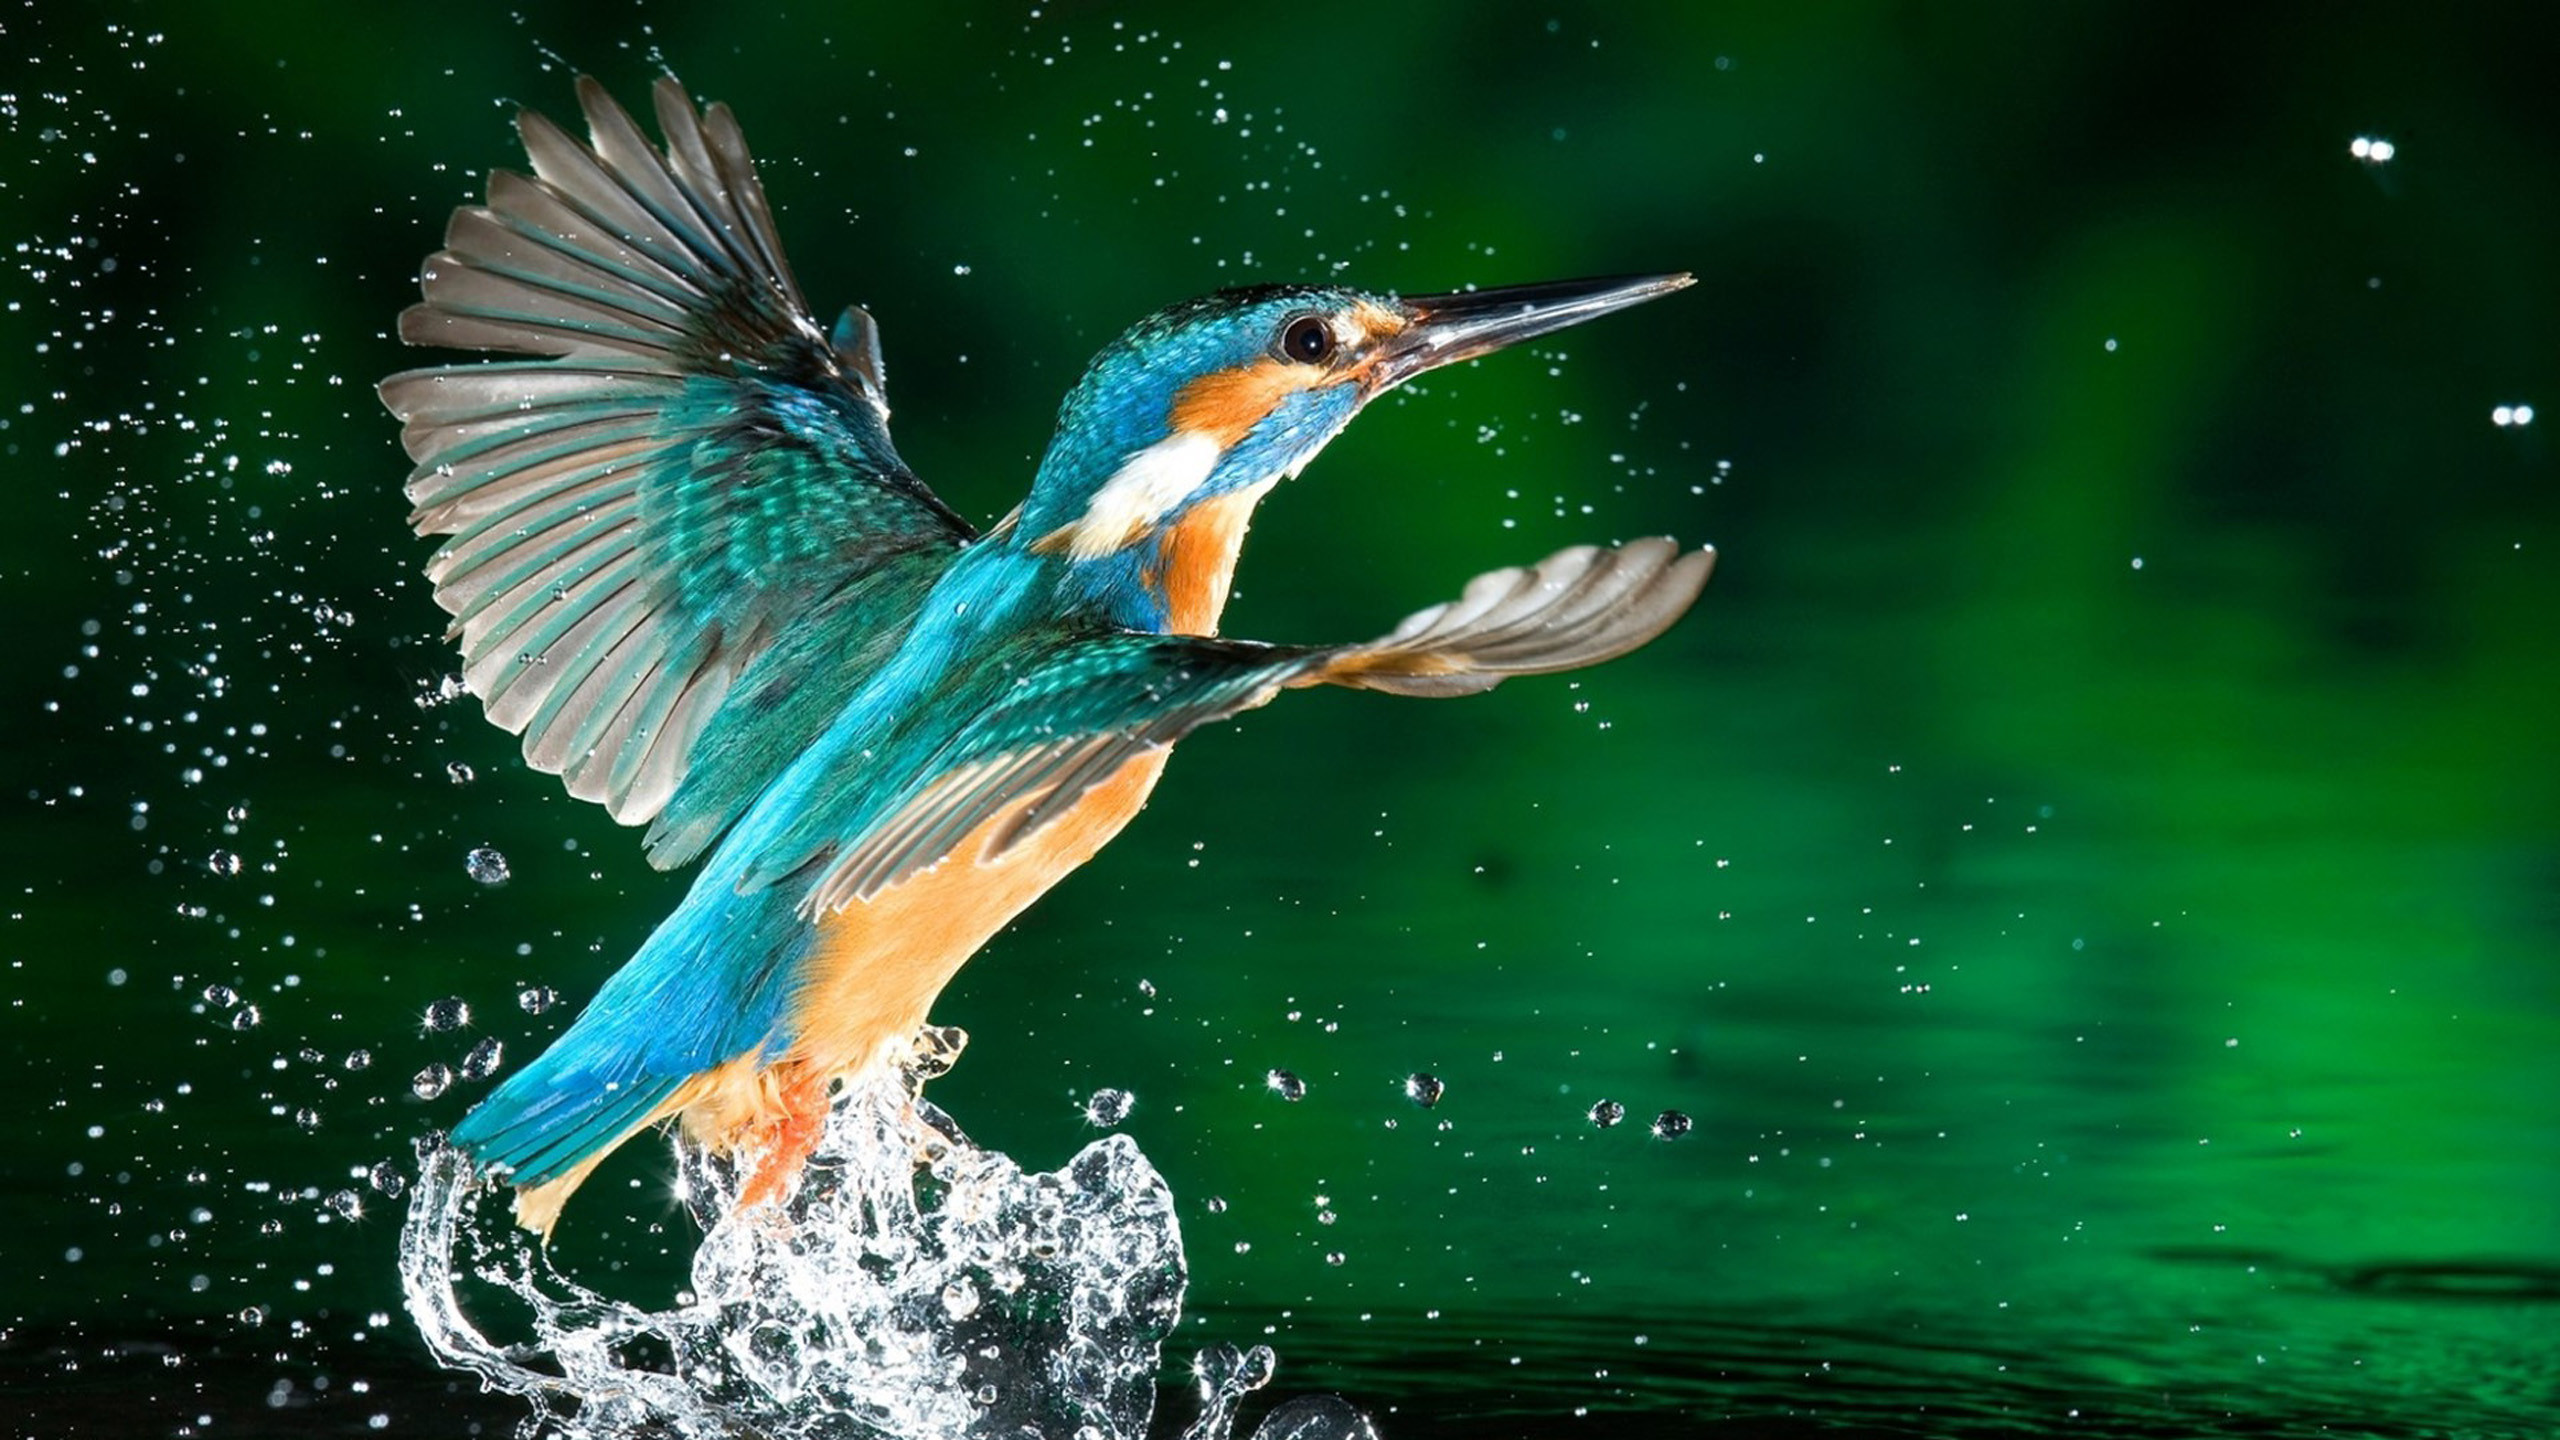 Rare animals desktop wallpaper, HD Desktop Wallpapers